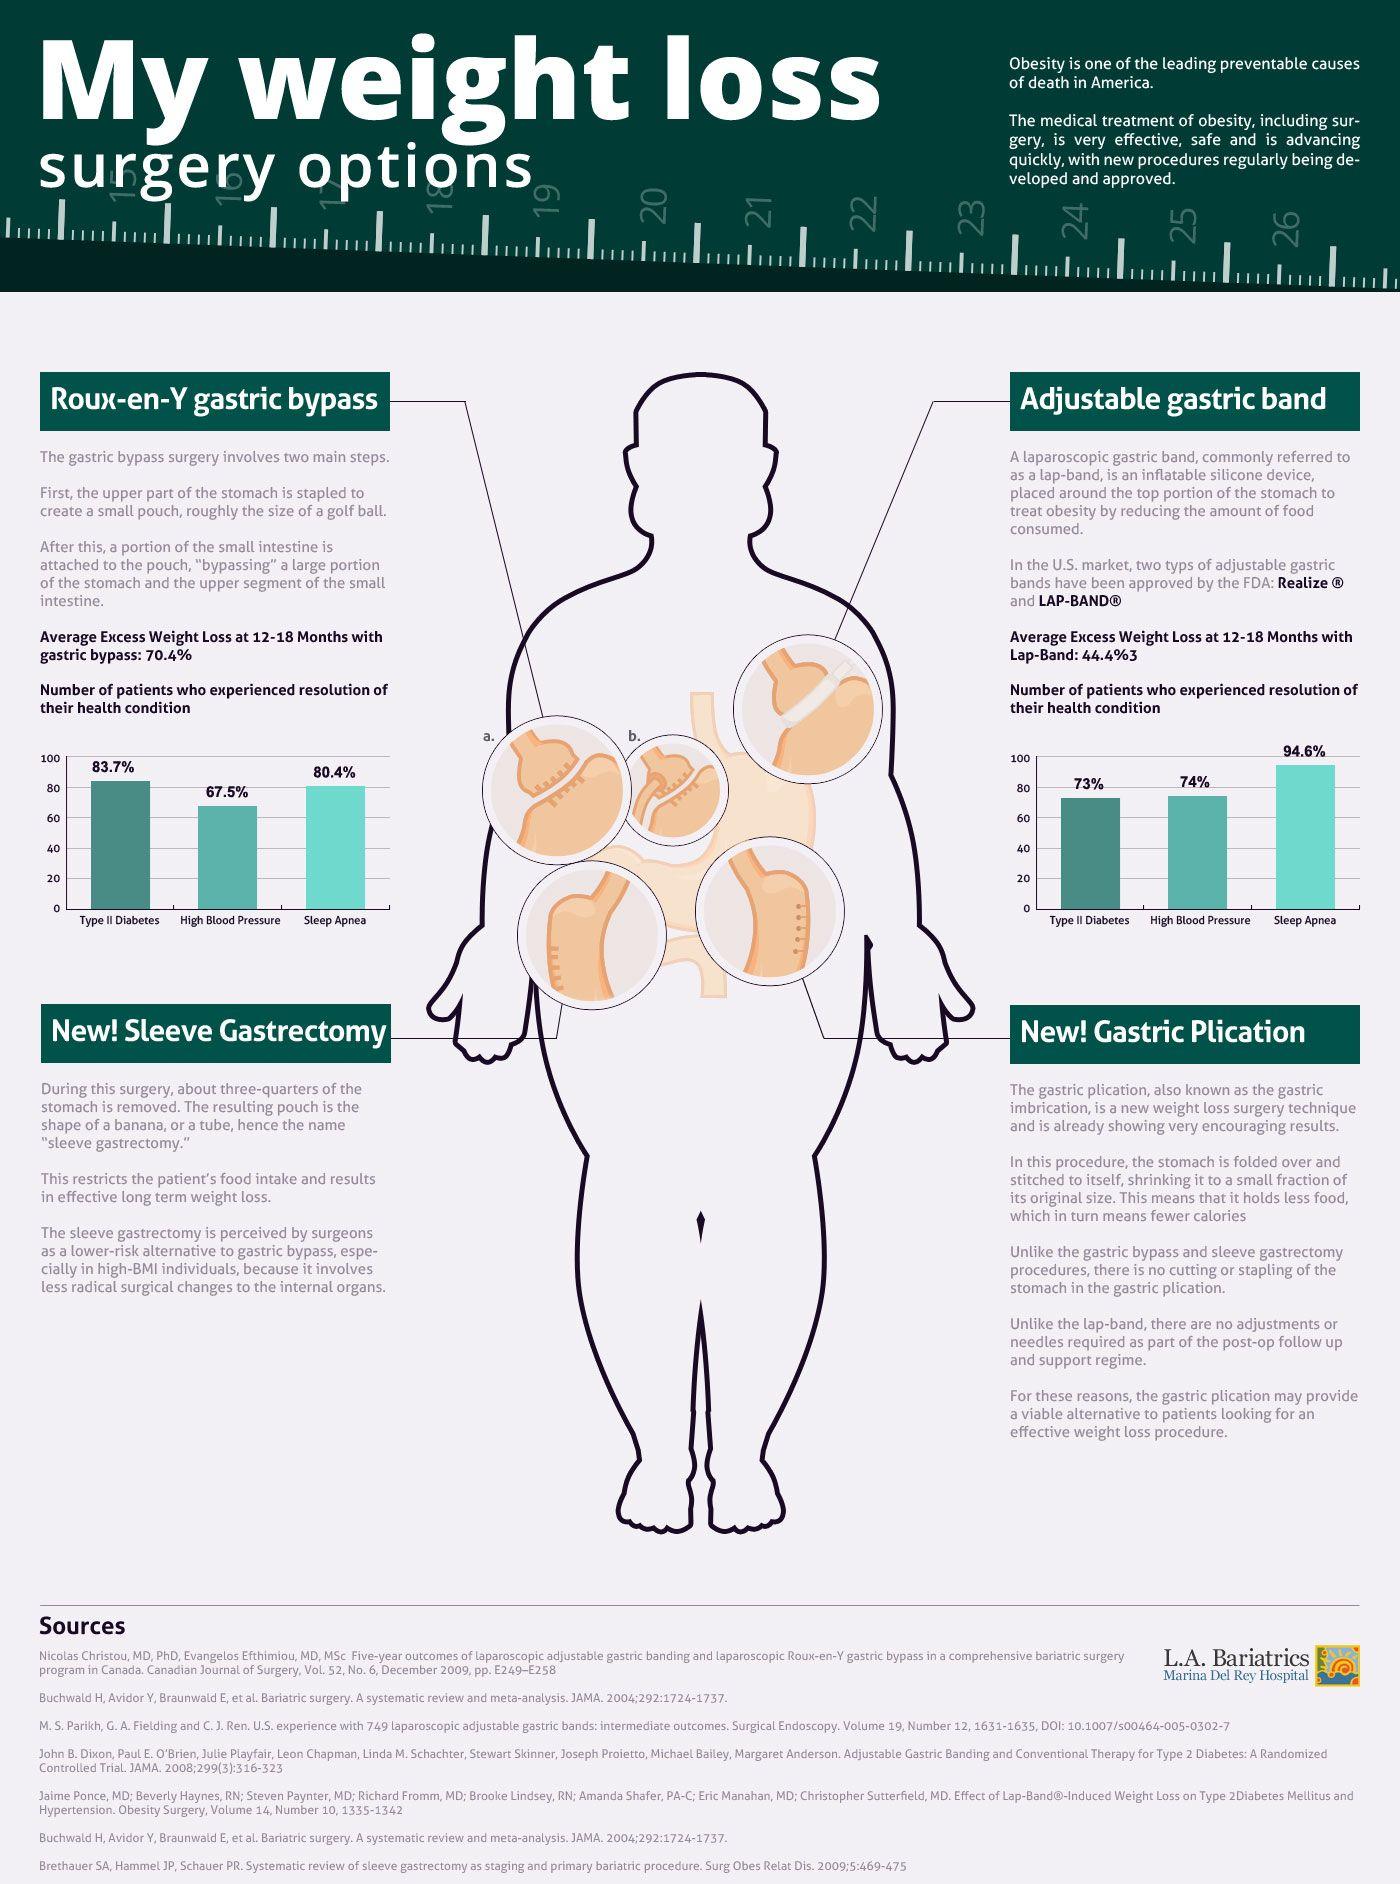 Fat burn heart rate bodybuilding image 9